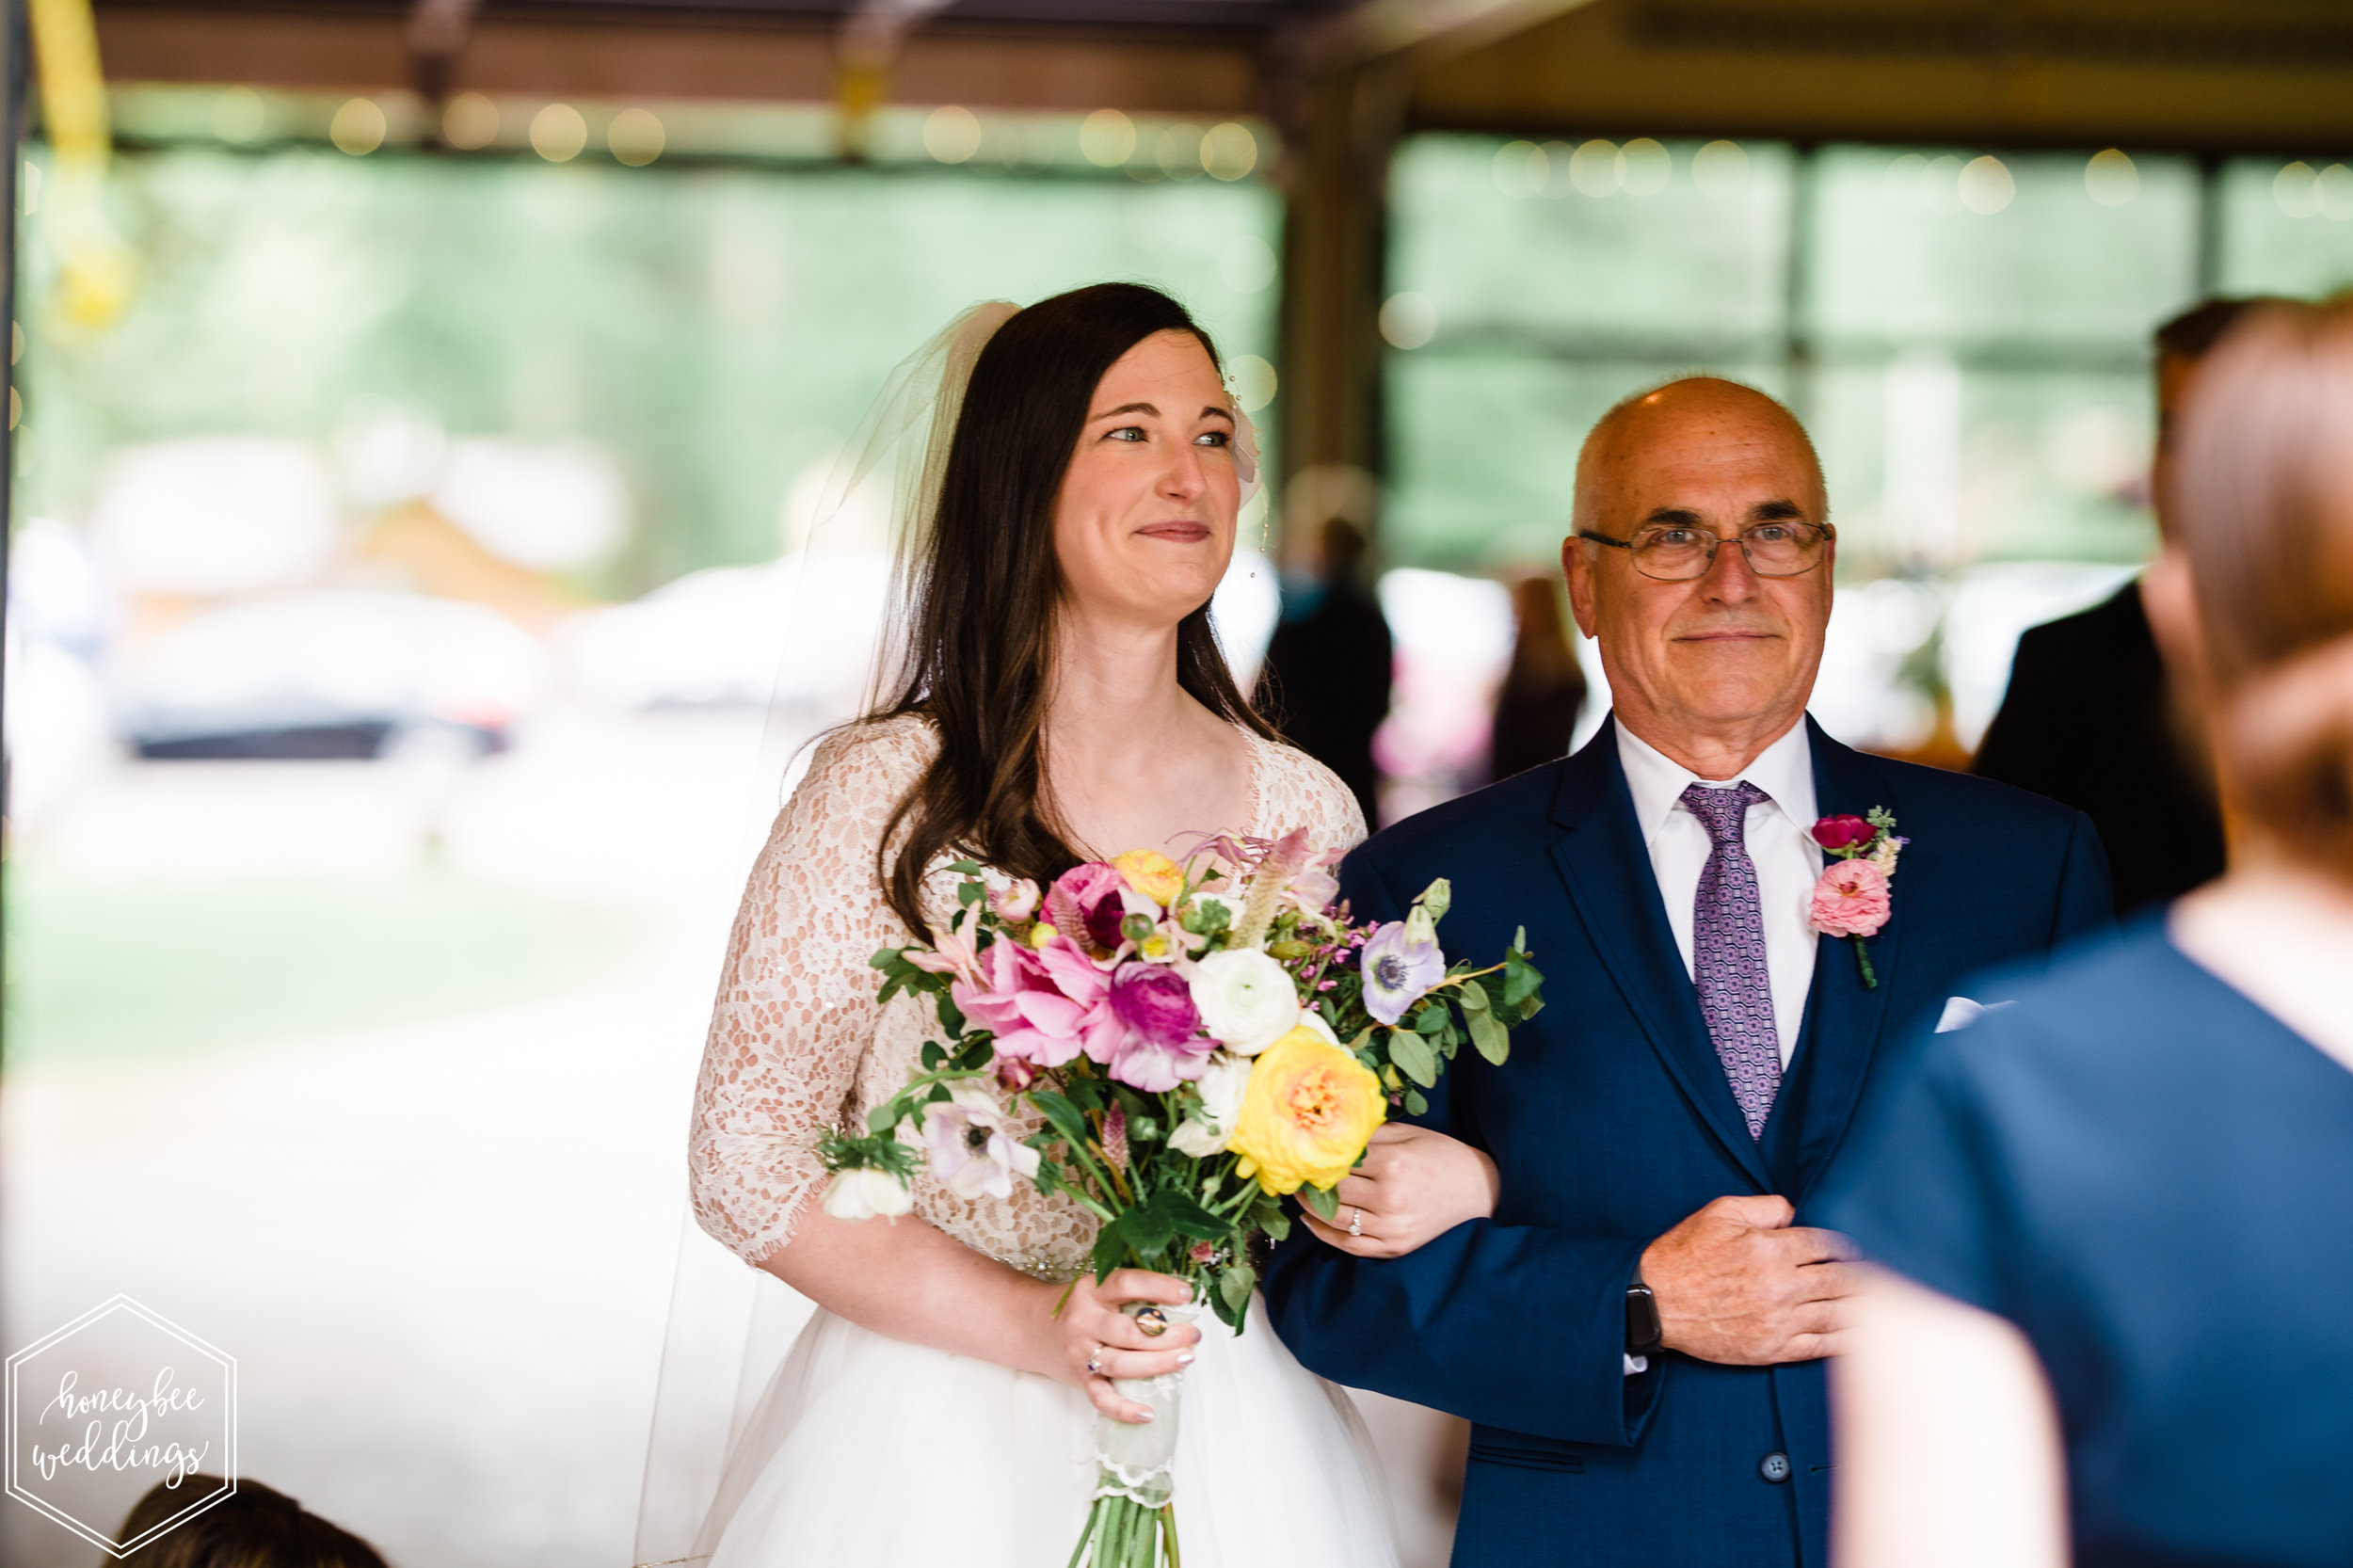 048Glacier National Park Wedding_Izaak Walton Inn Wedding_Honeybee Weddings_Norah & Kyle_June 08, 2019-2136.jpg